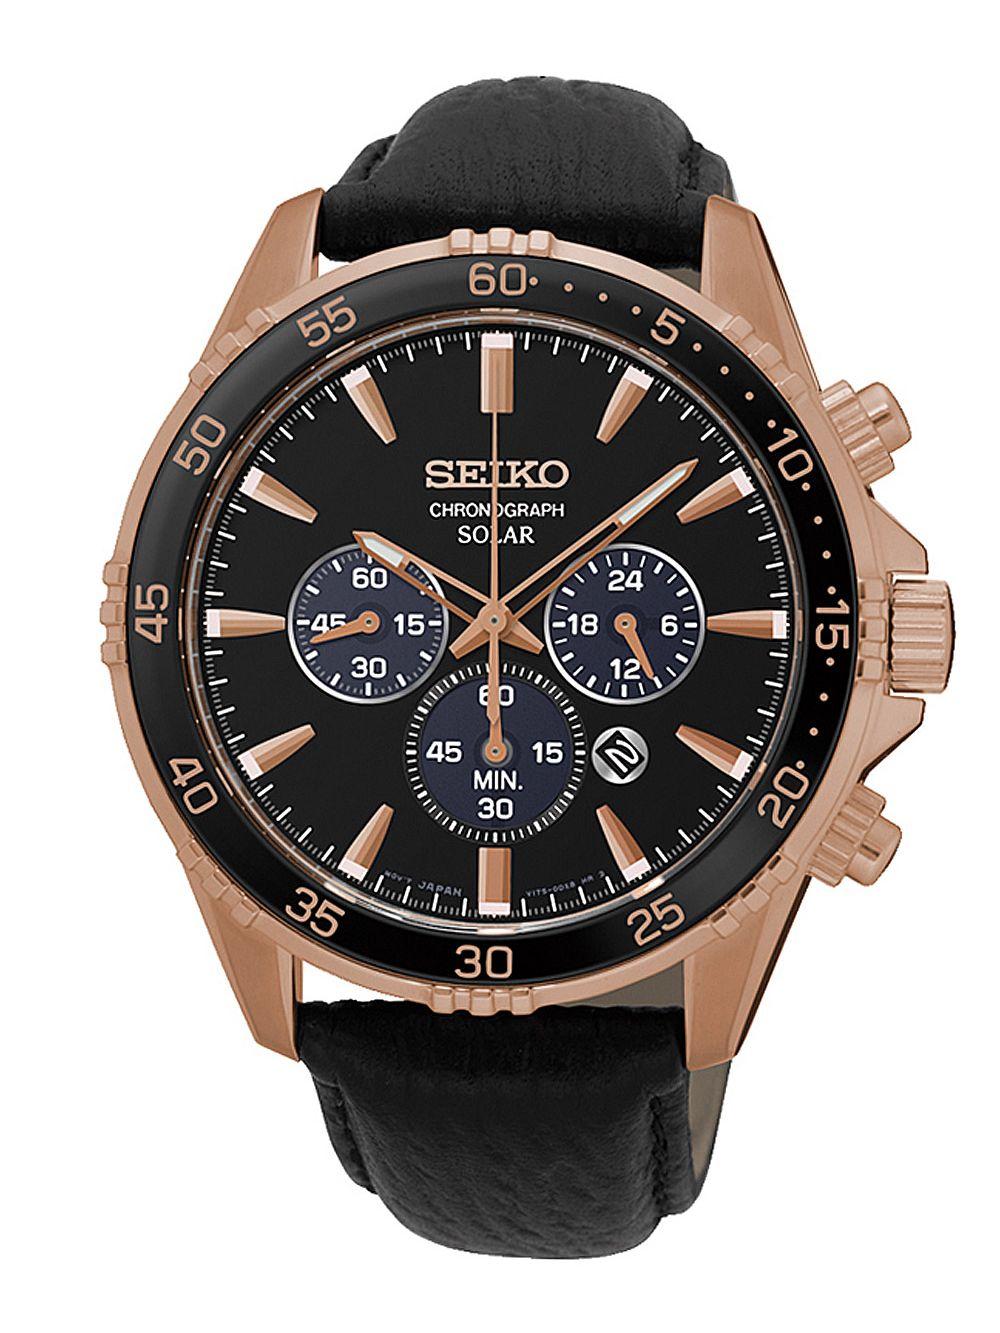 82833ccfe Seiko SSC448P1 Solar Men´s Watch Chronograph Image 1 ...